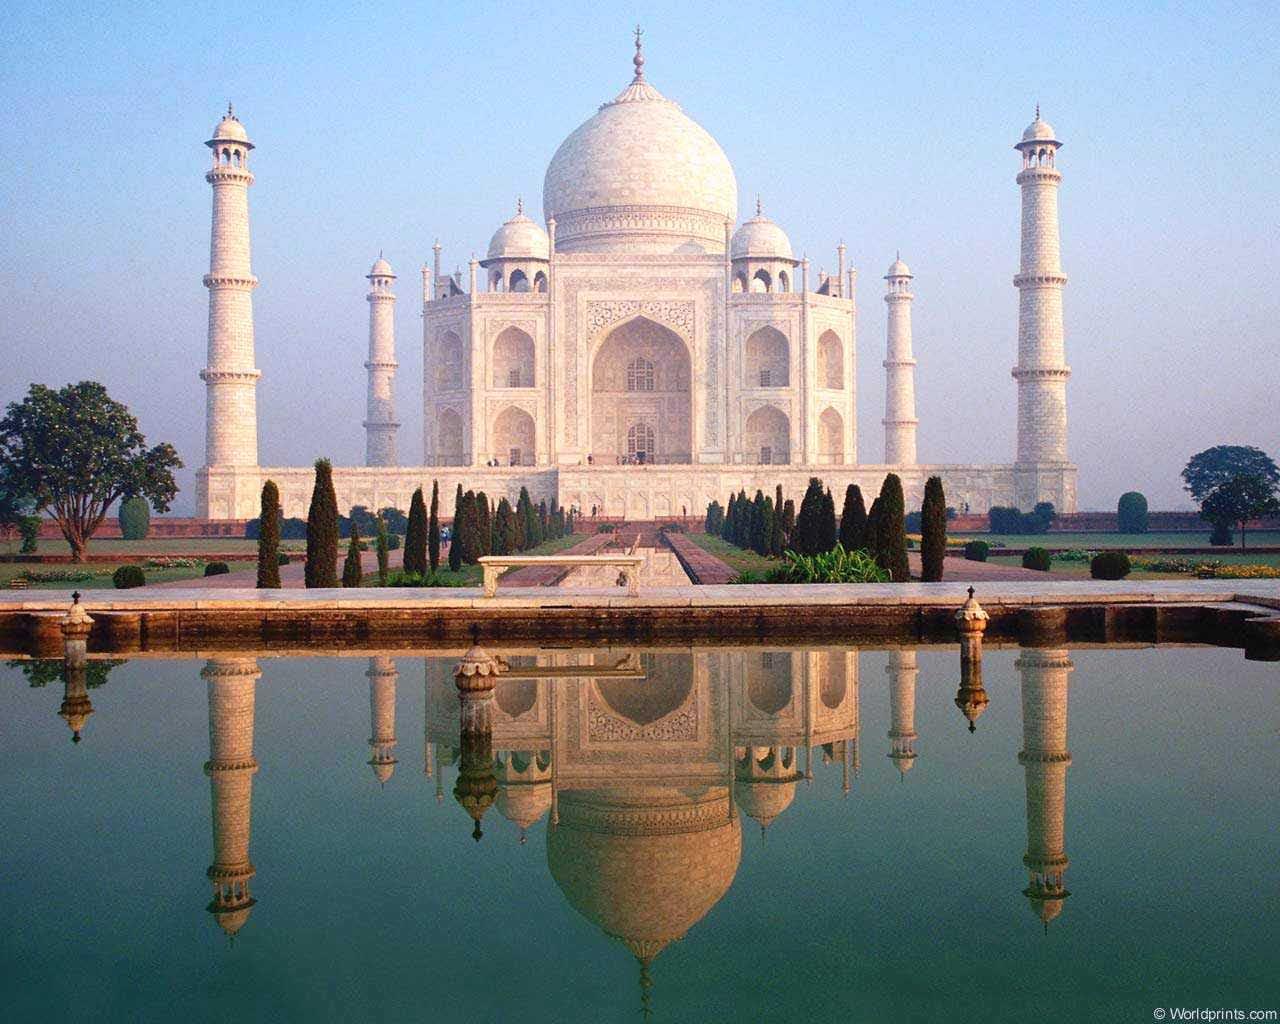 The Most Beautiful Cities The Taj Mahal The Masterpiece Of Art